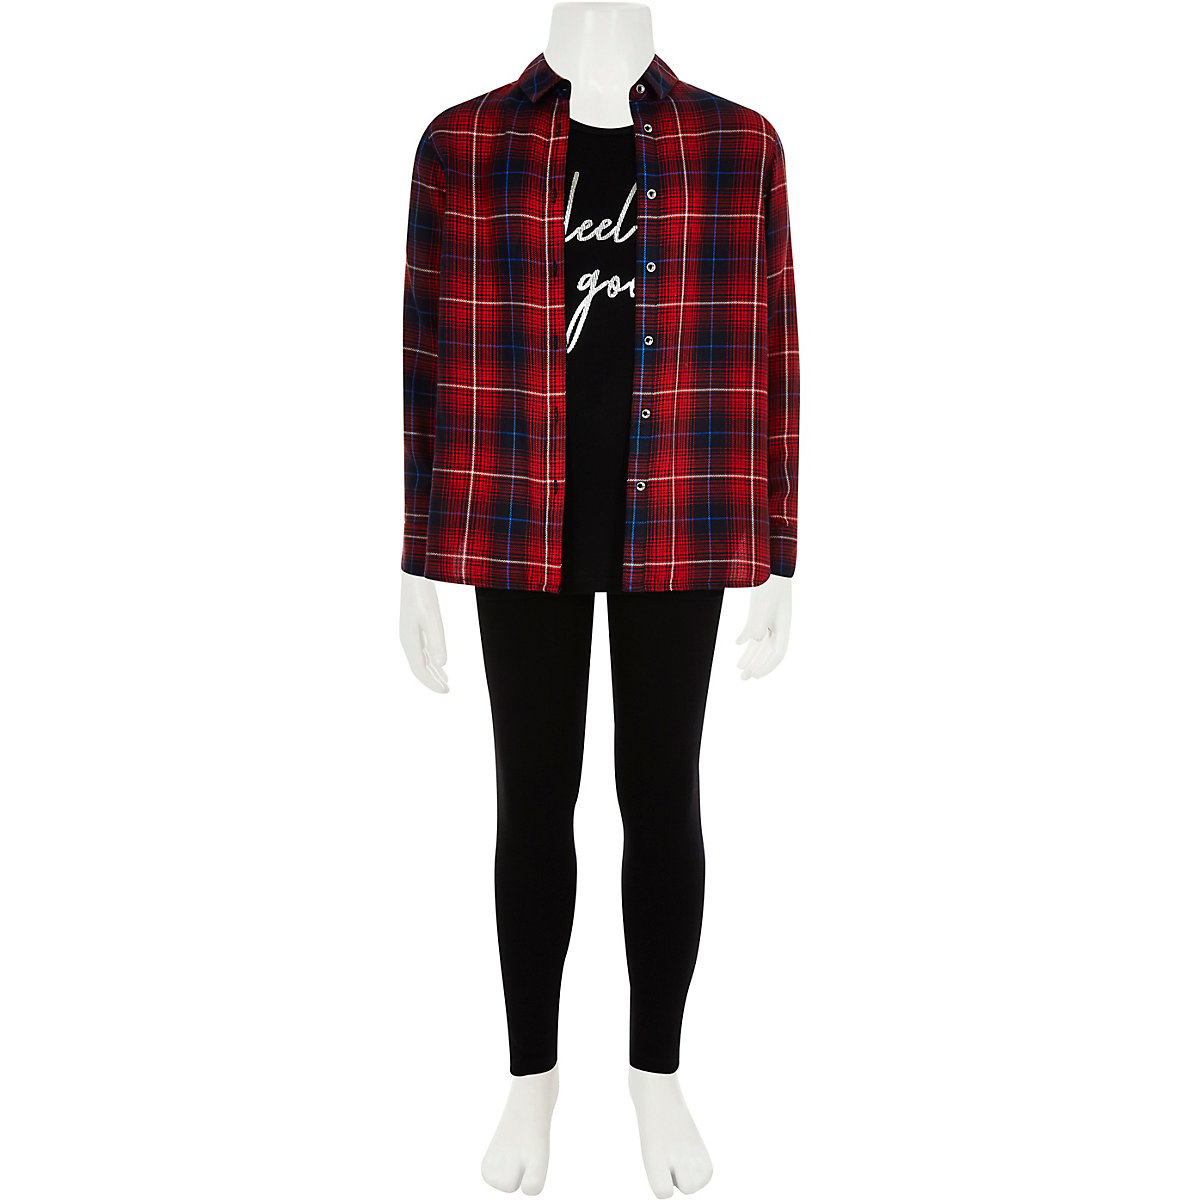 Girls red check shirt and leggings set